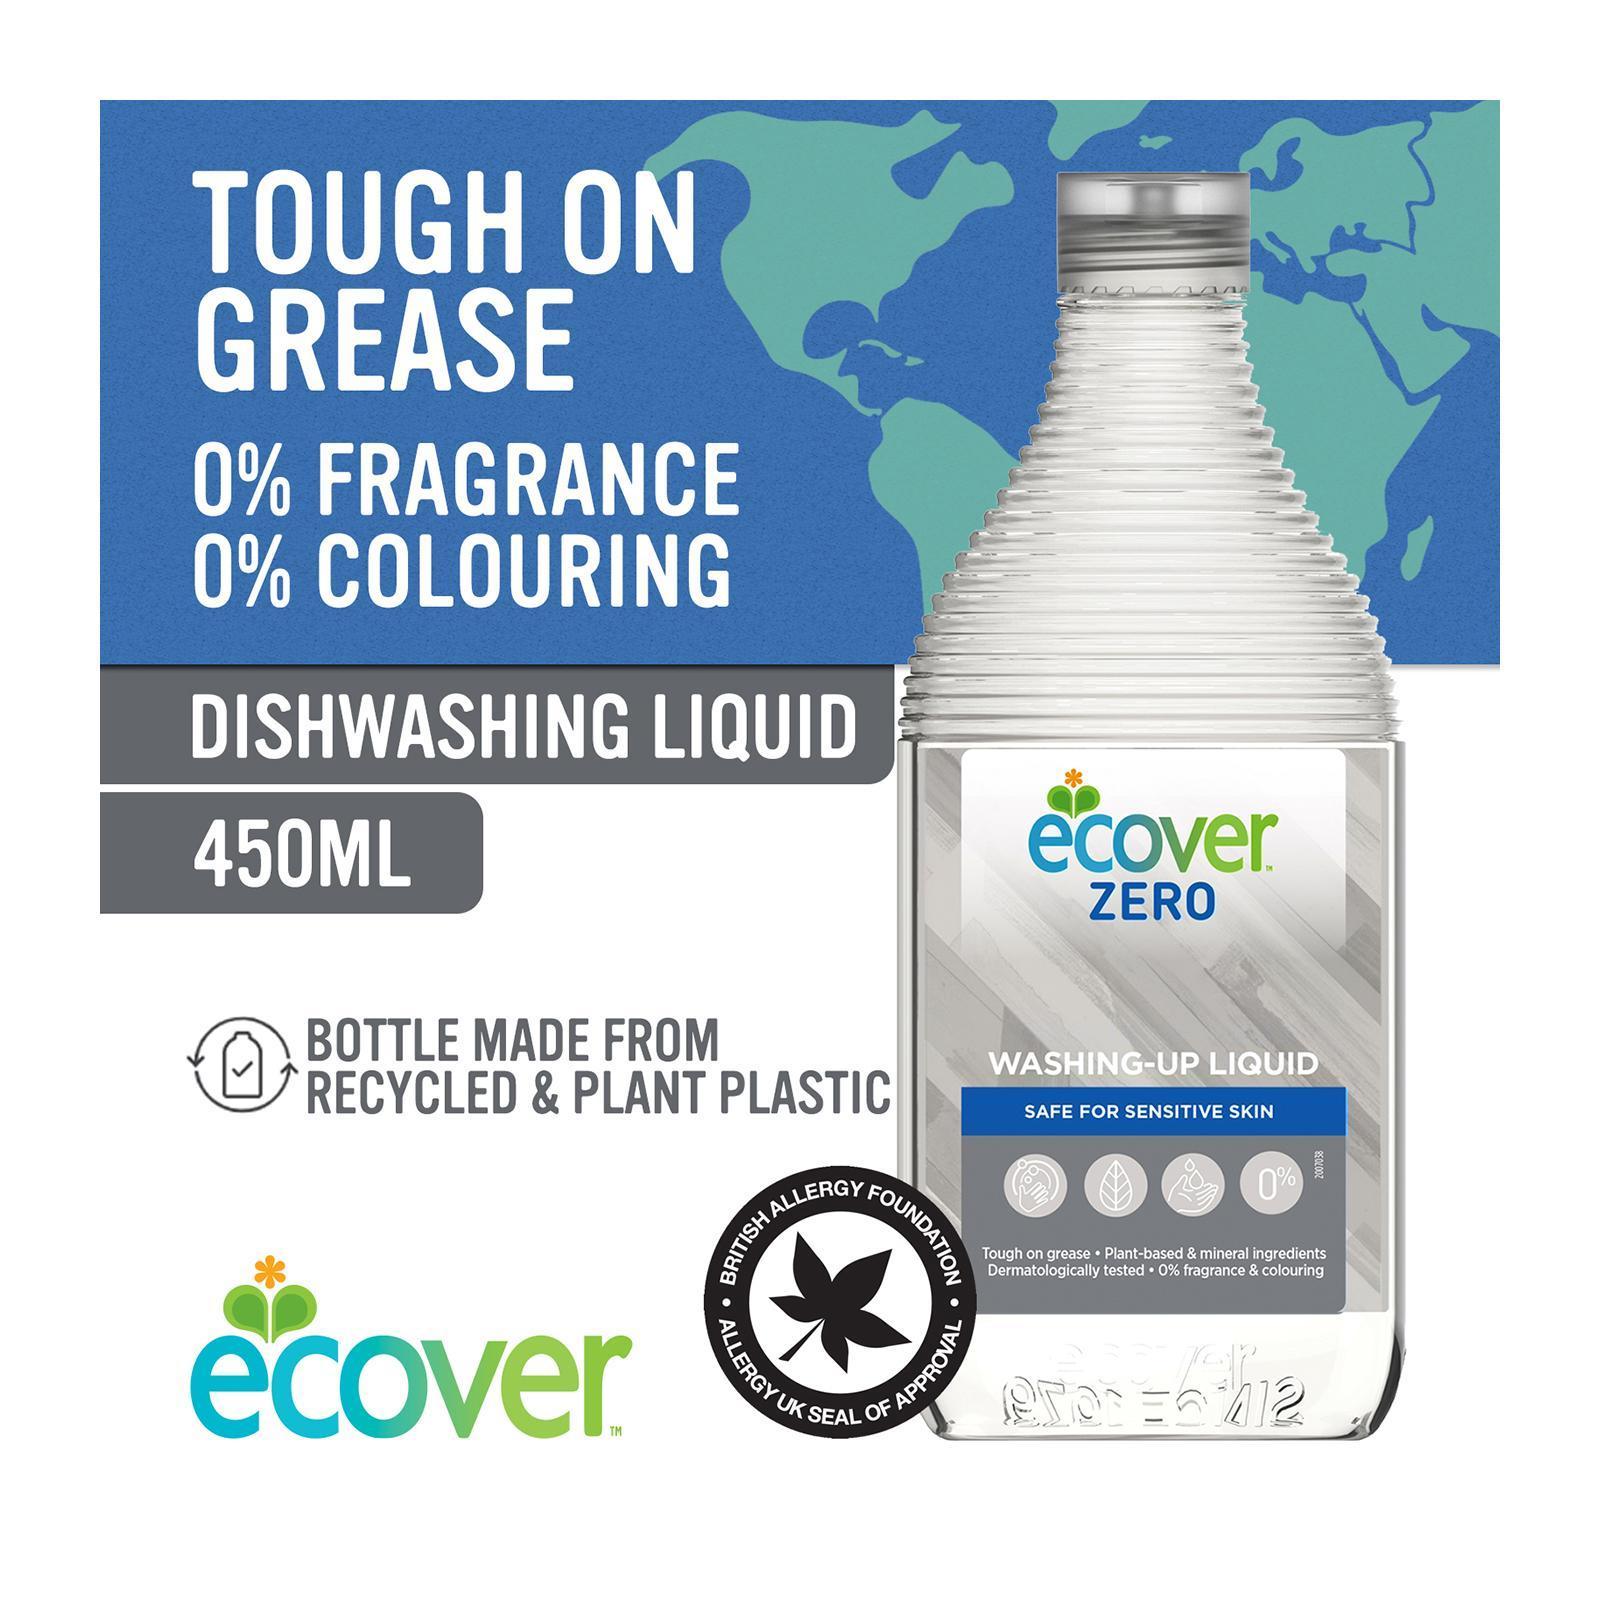 Ecover Zero Washing Up Liquid - By Corlison